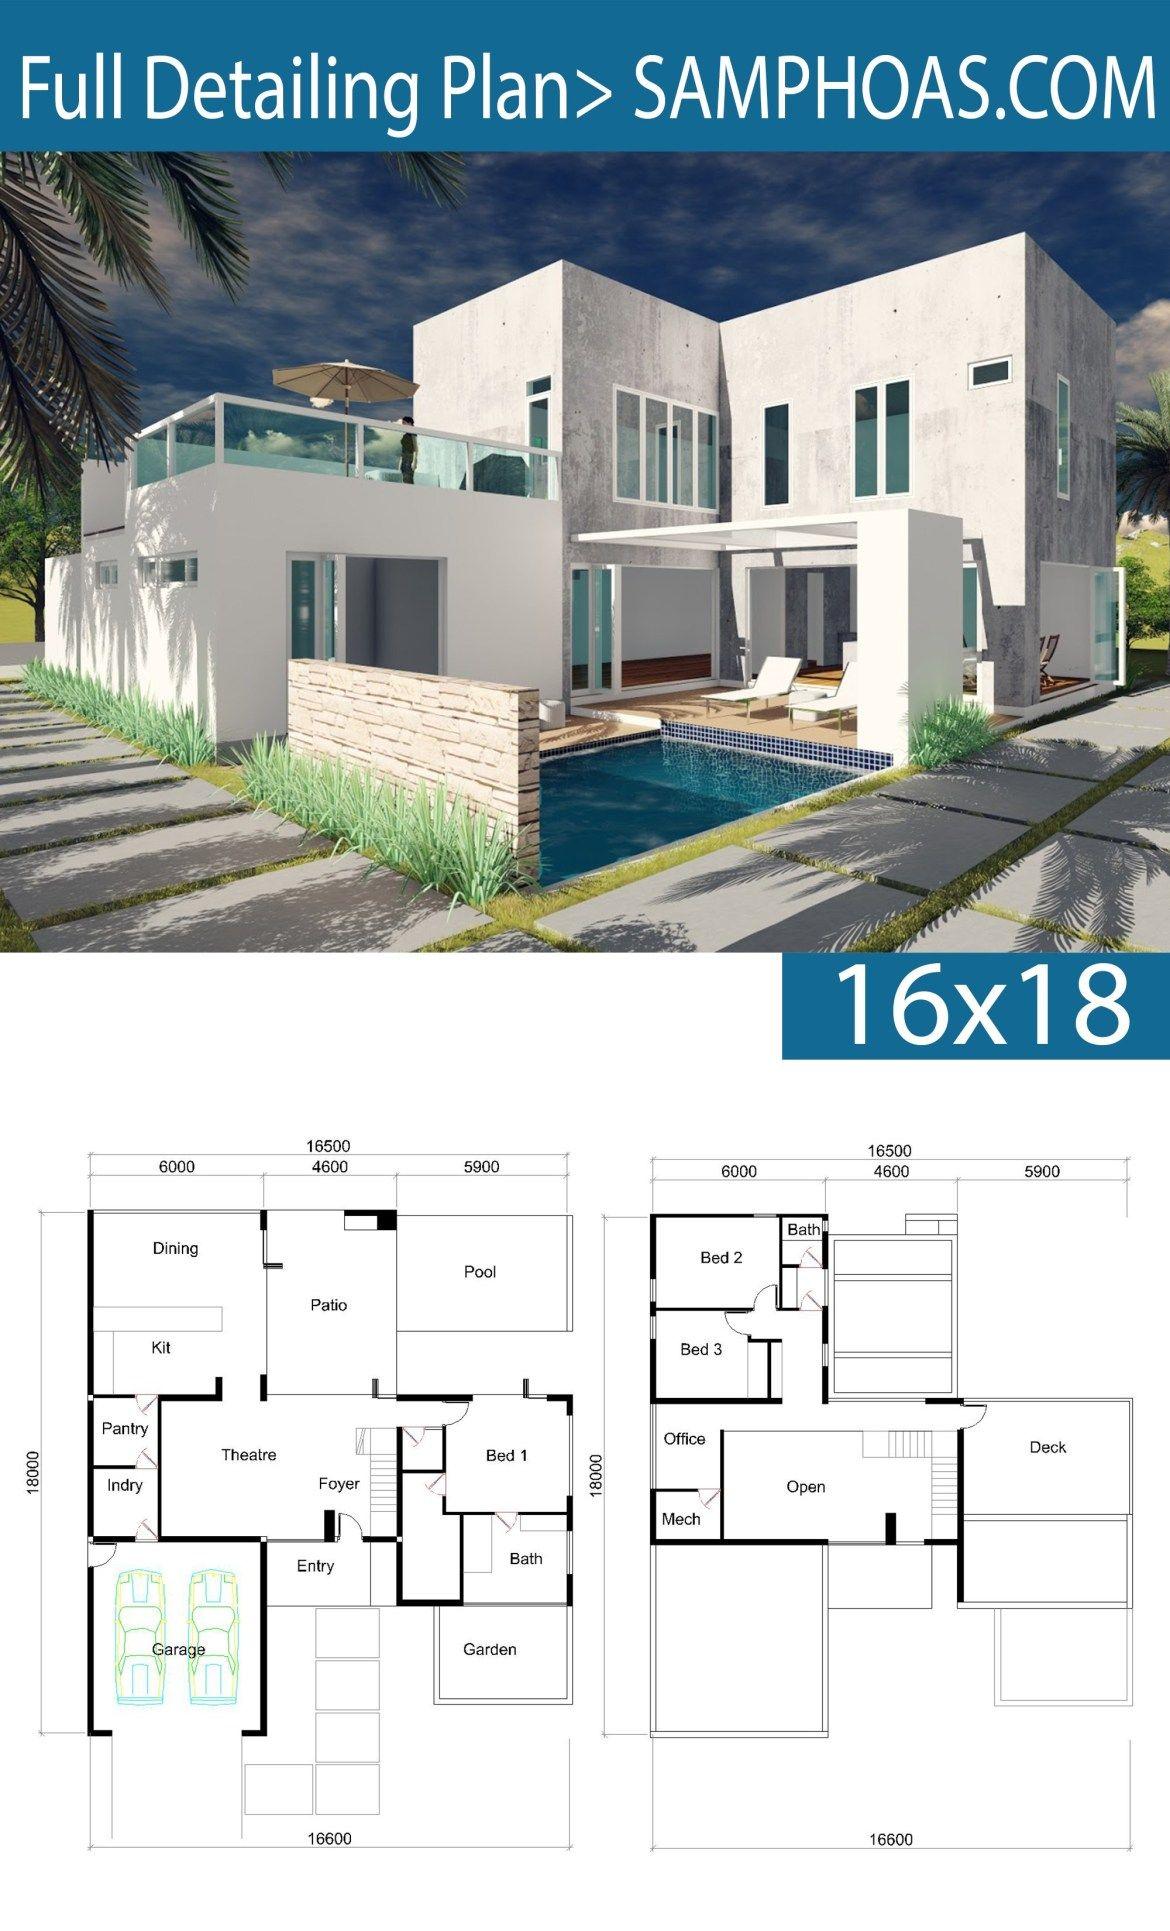 3 Bedrooms Villa Design 16x18m Samphoas Plansearch Villa Design Architectural House Plans Modern House Plans